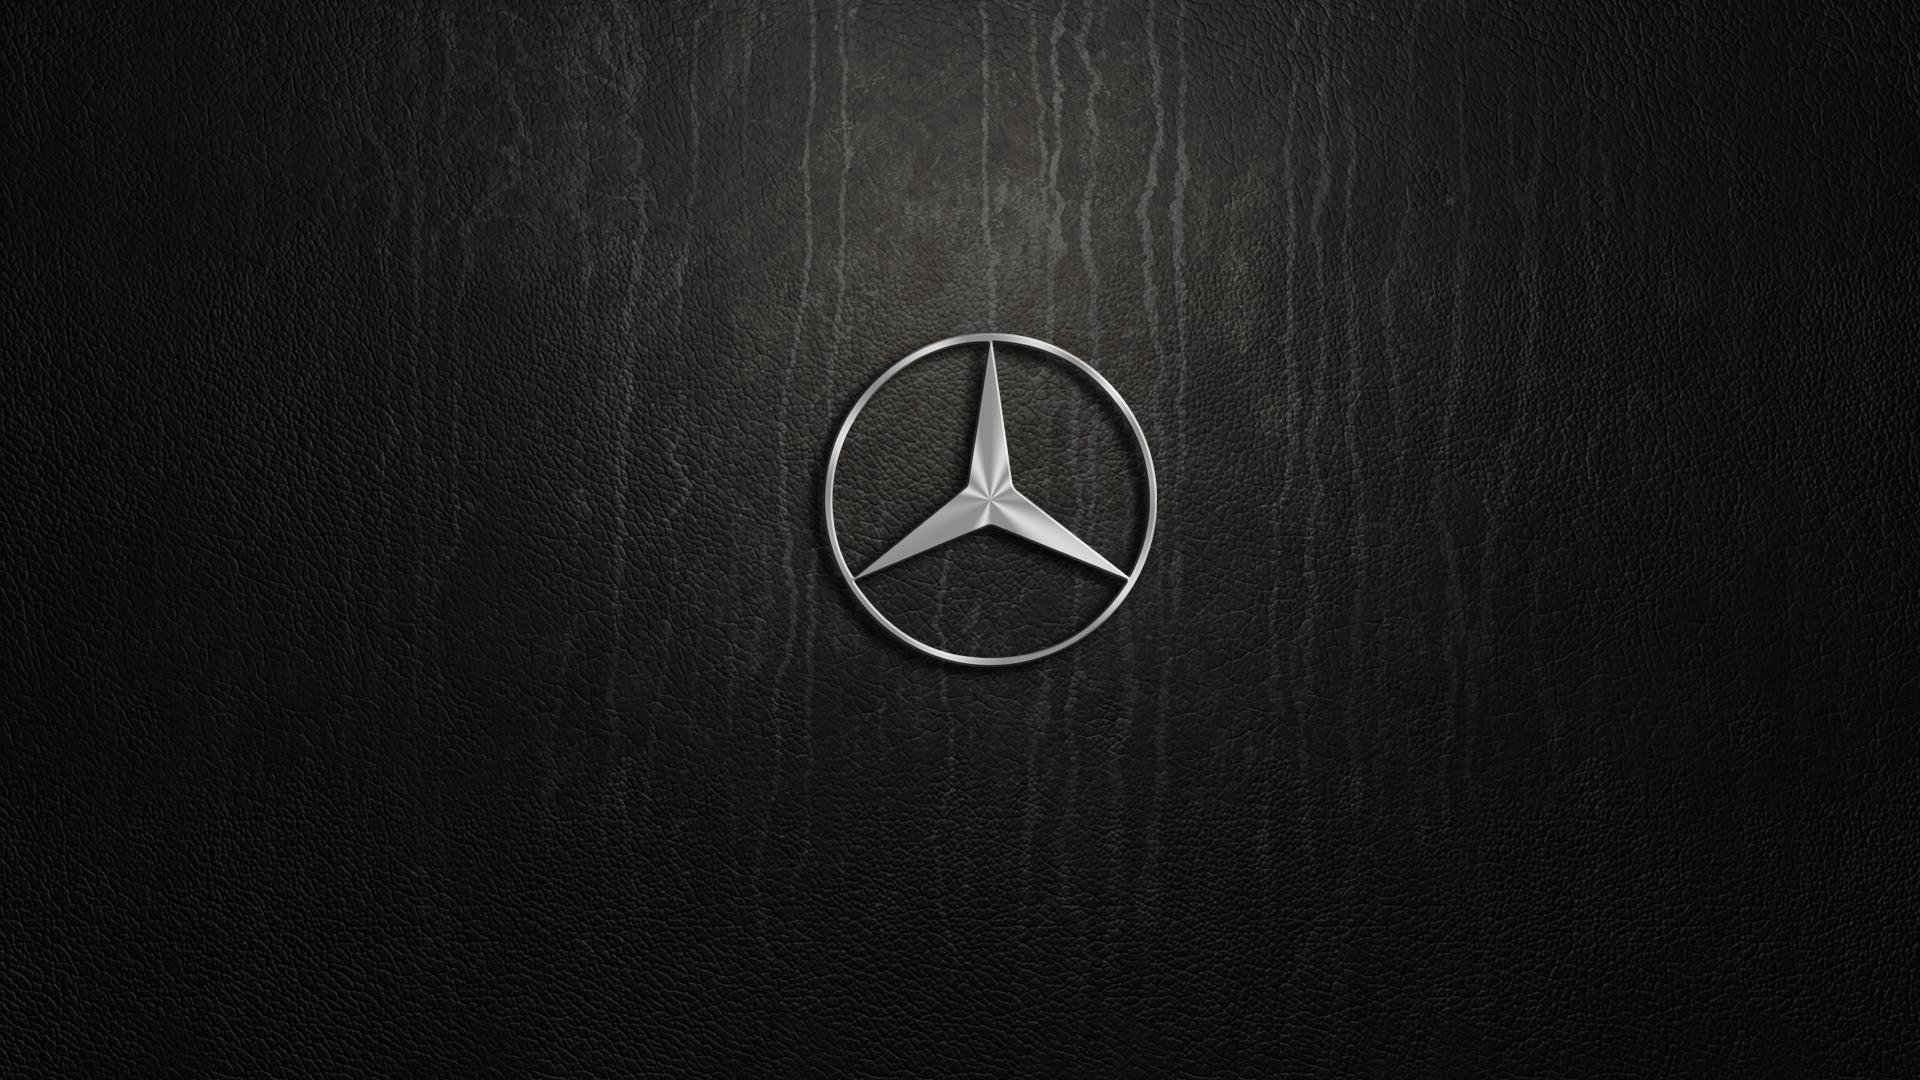 Mercedes Logo Wallpaper For Iphone Sdeerwallpaper